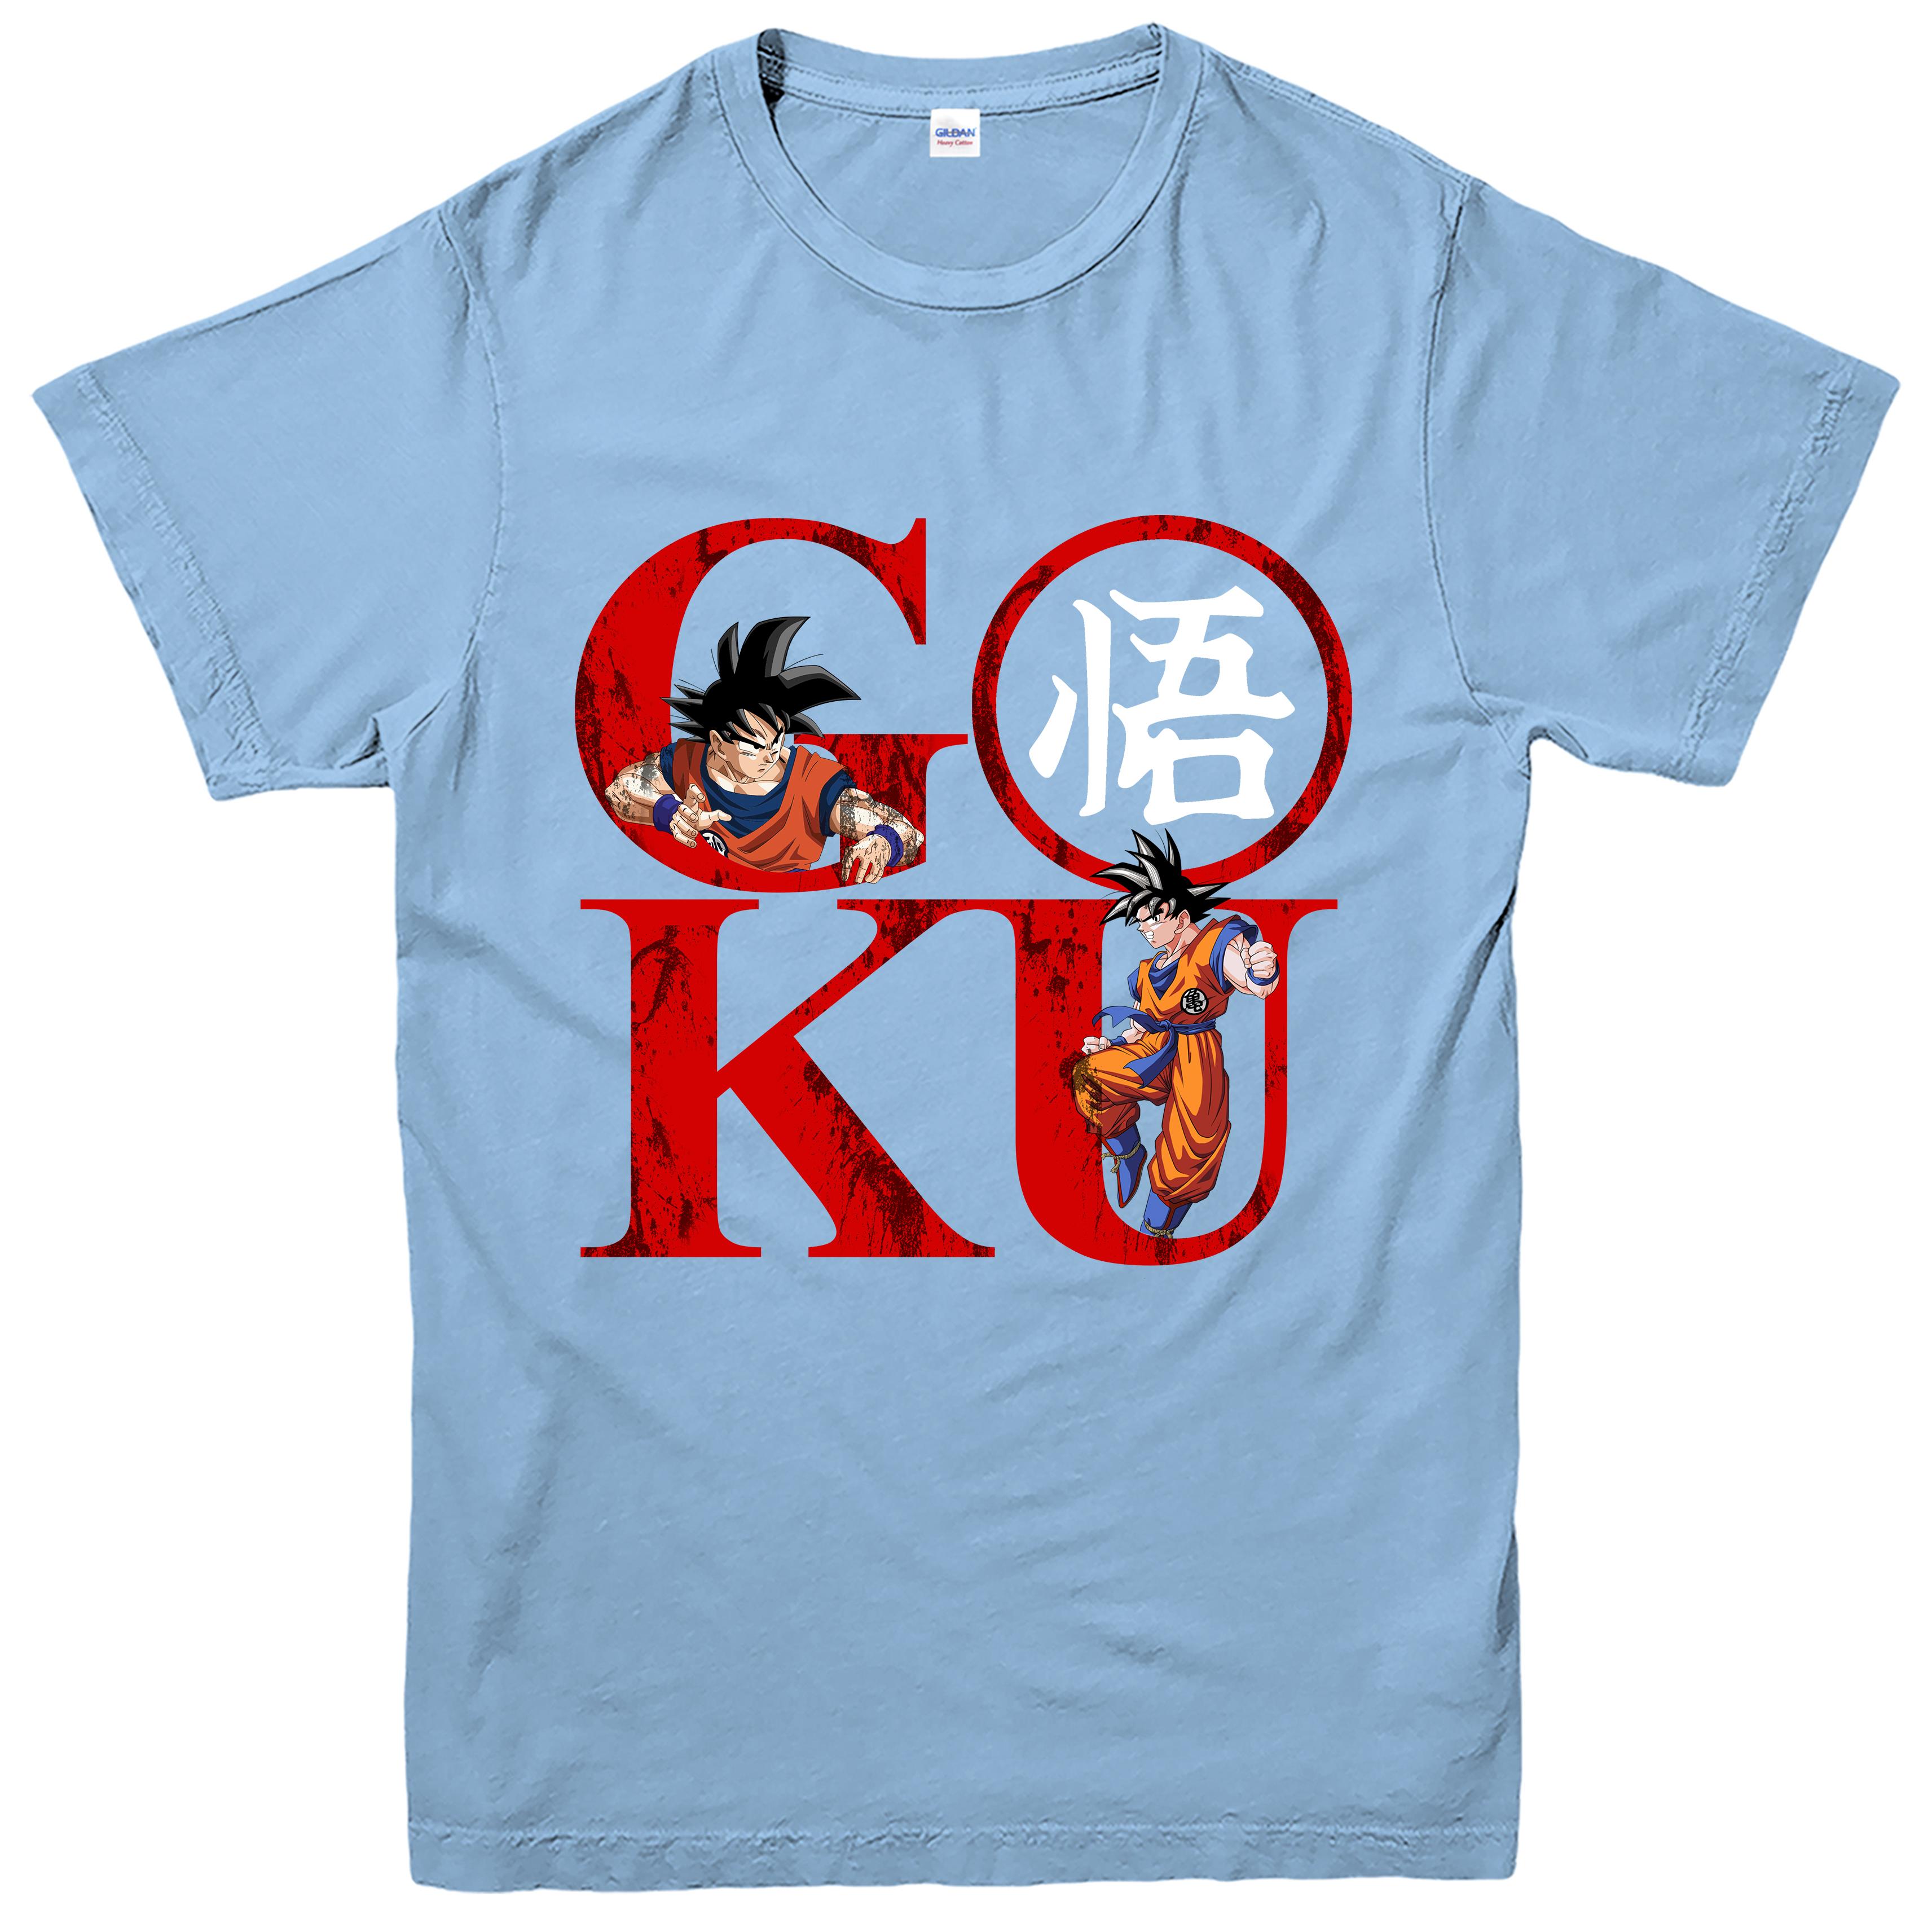 Dragon ball z goku logo t shirt mediwiki wiki des ecn medecine goku logo t shirt goku inspire dragon ball buycottarizona Choice Image